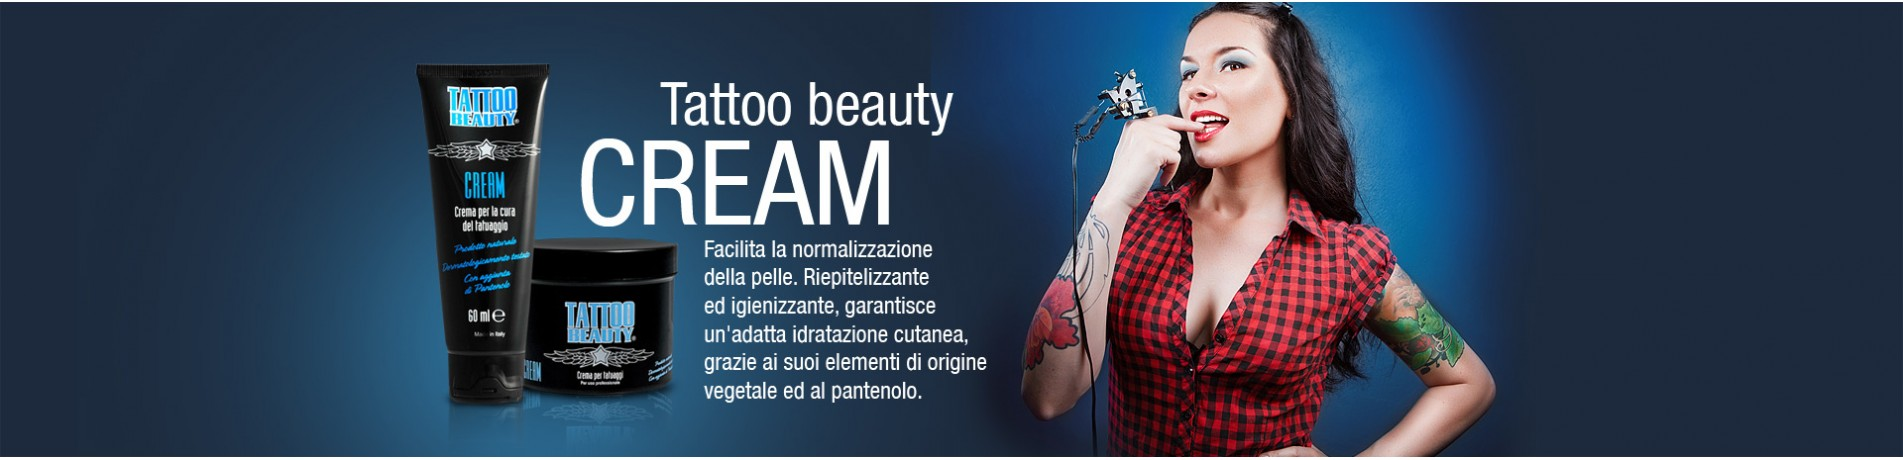 tattoo beauty cream